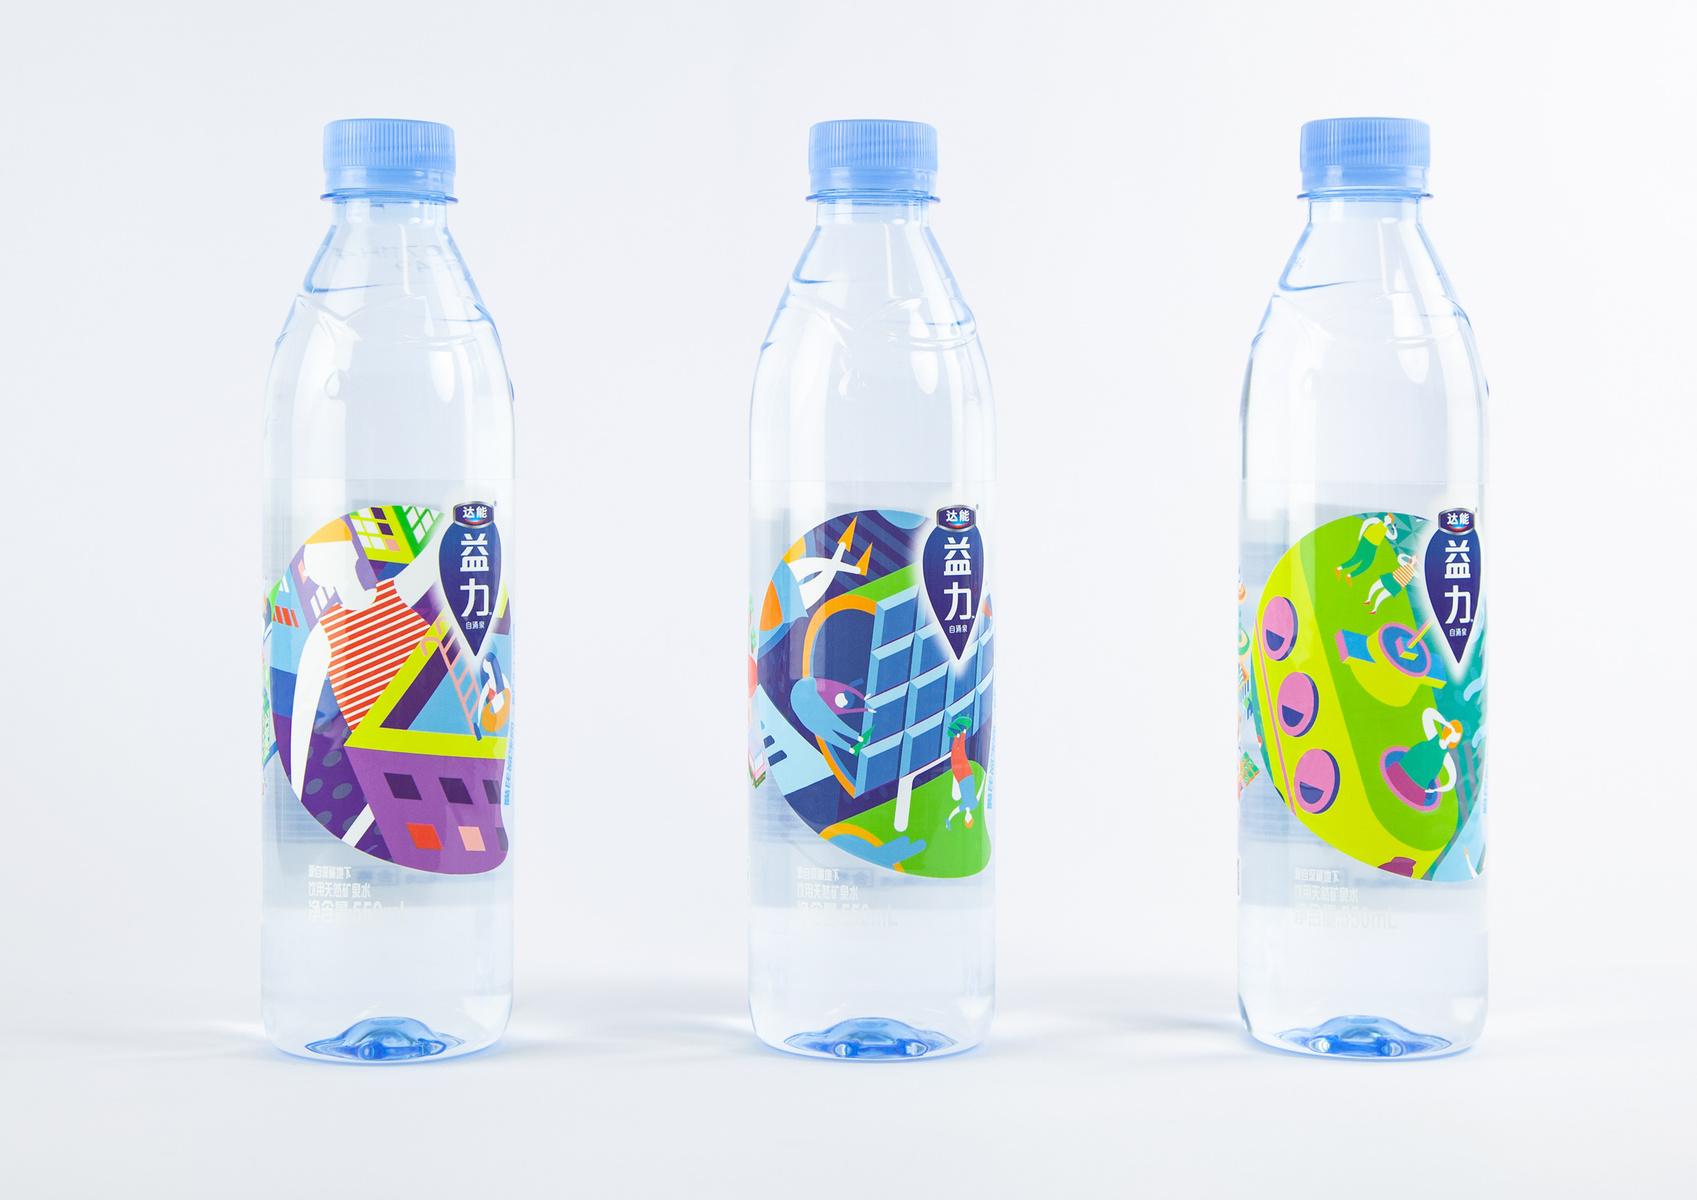 Danone Health Water X MEIYIJIA Limited Edition